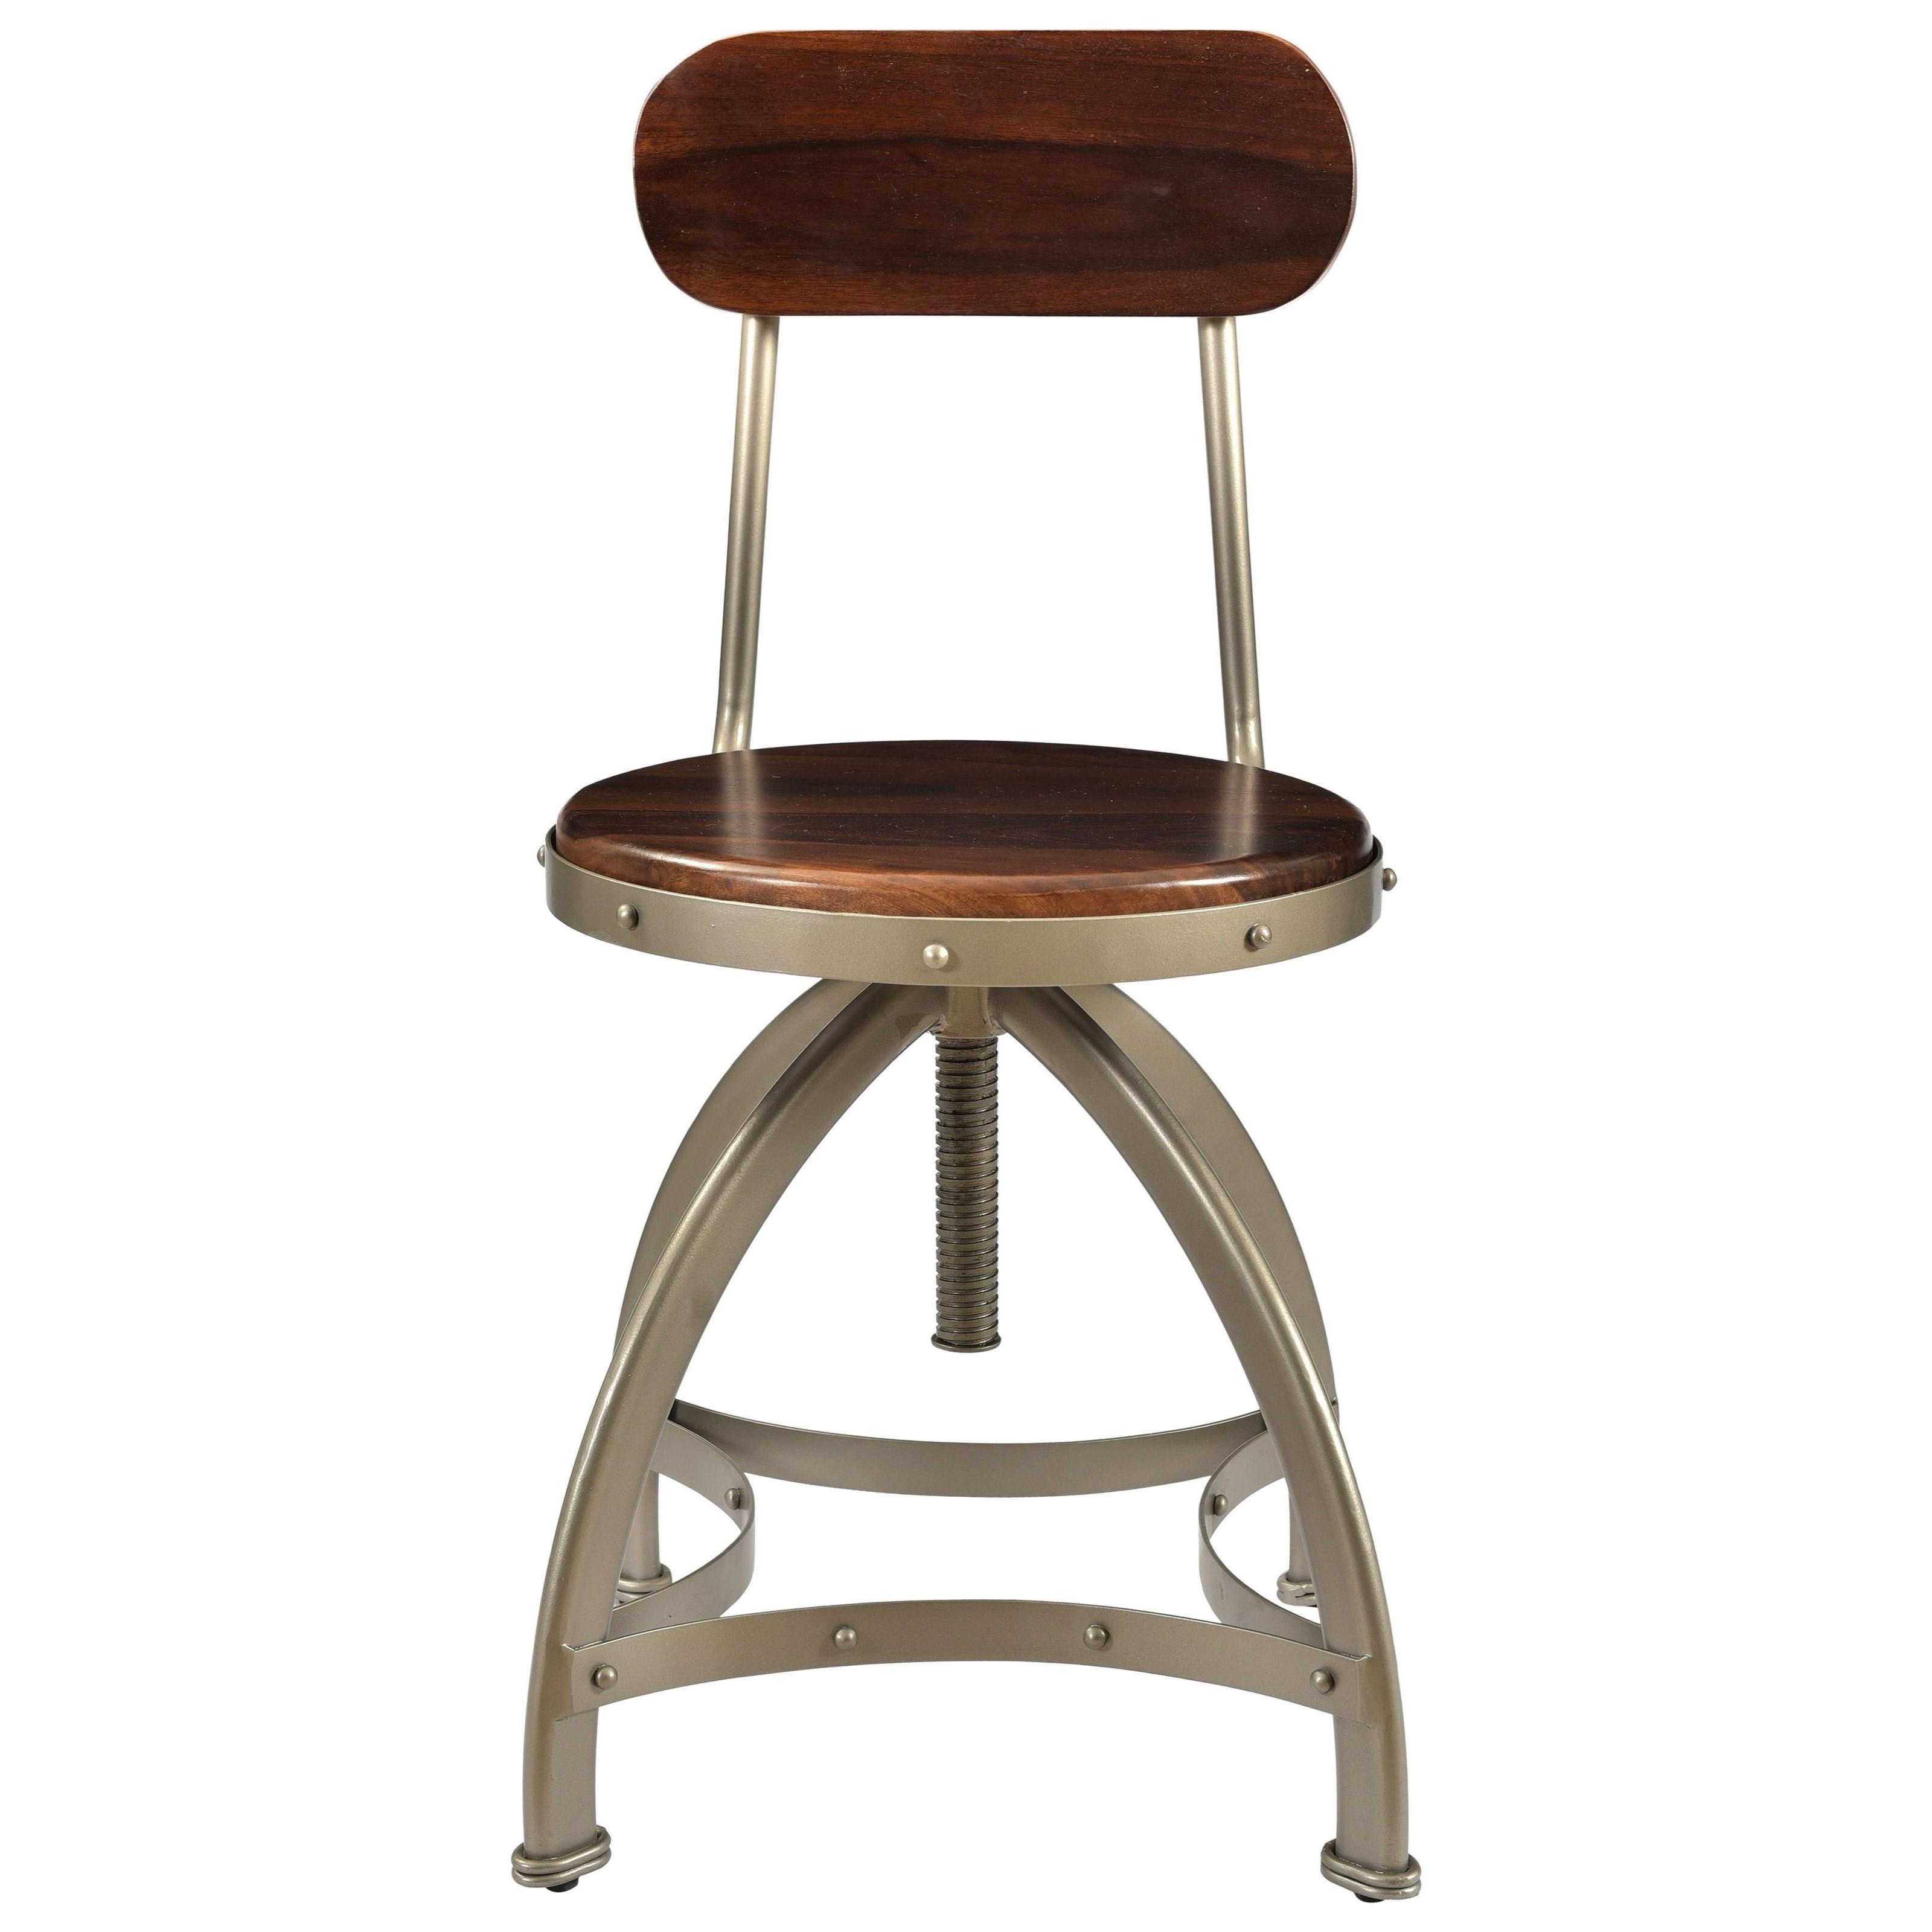 Tacoma Adjustable Barstool by C2C at Walker's Furniture